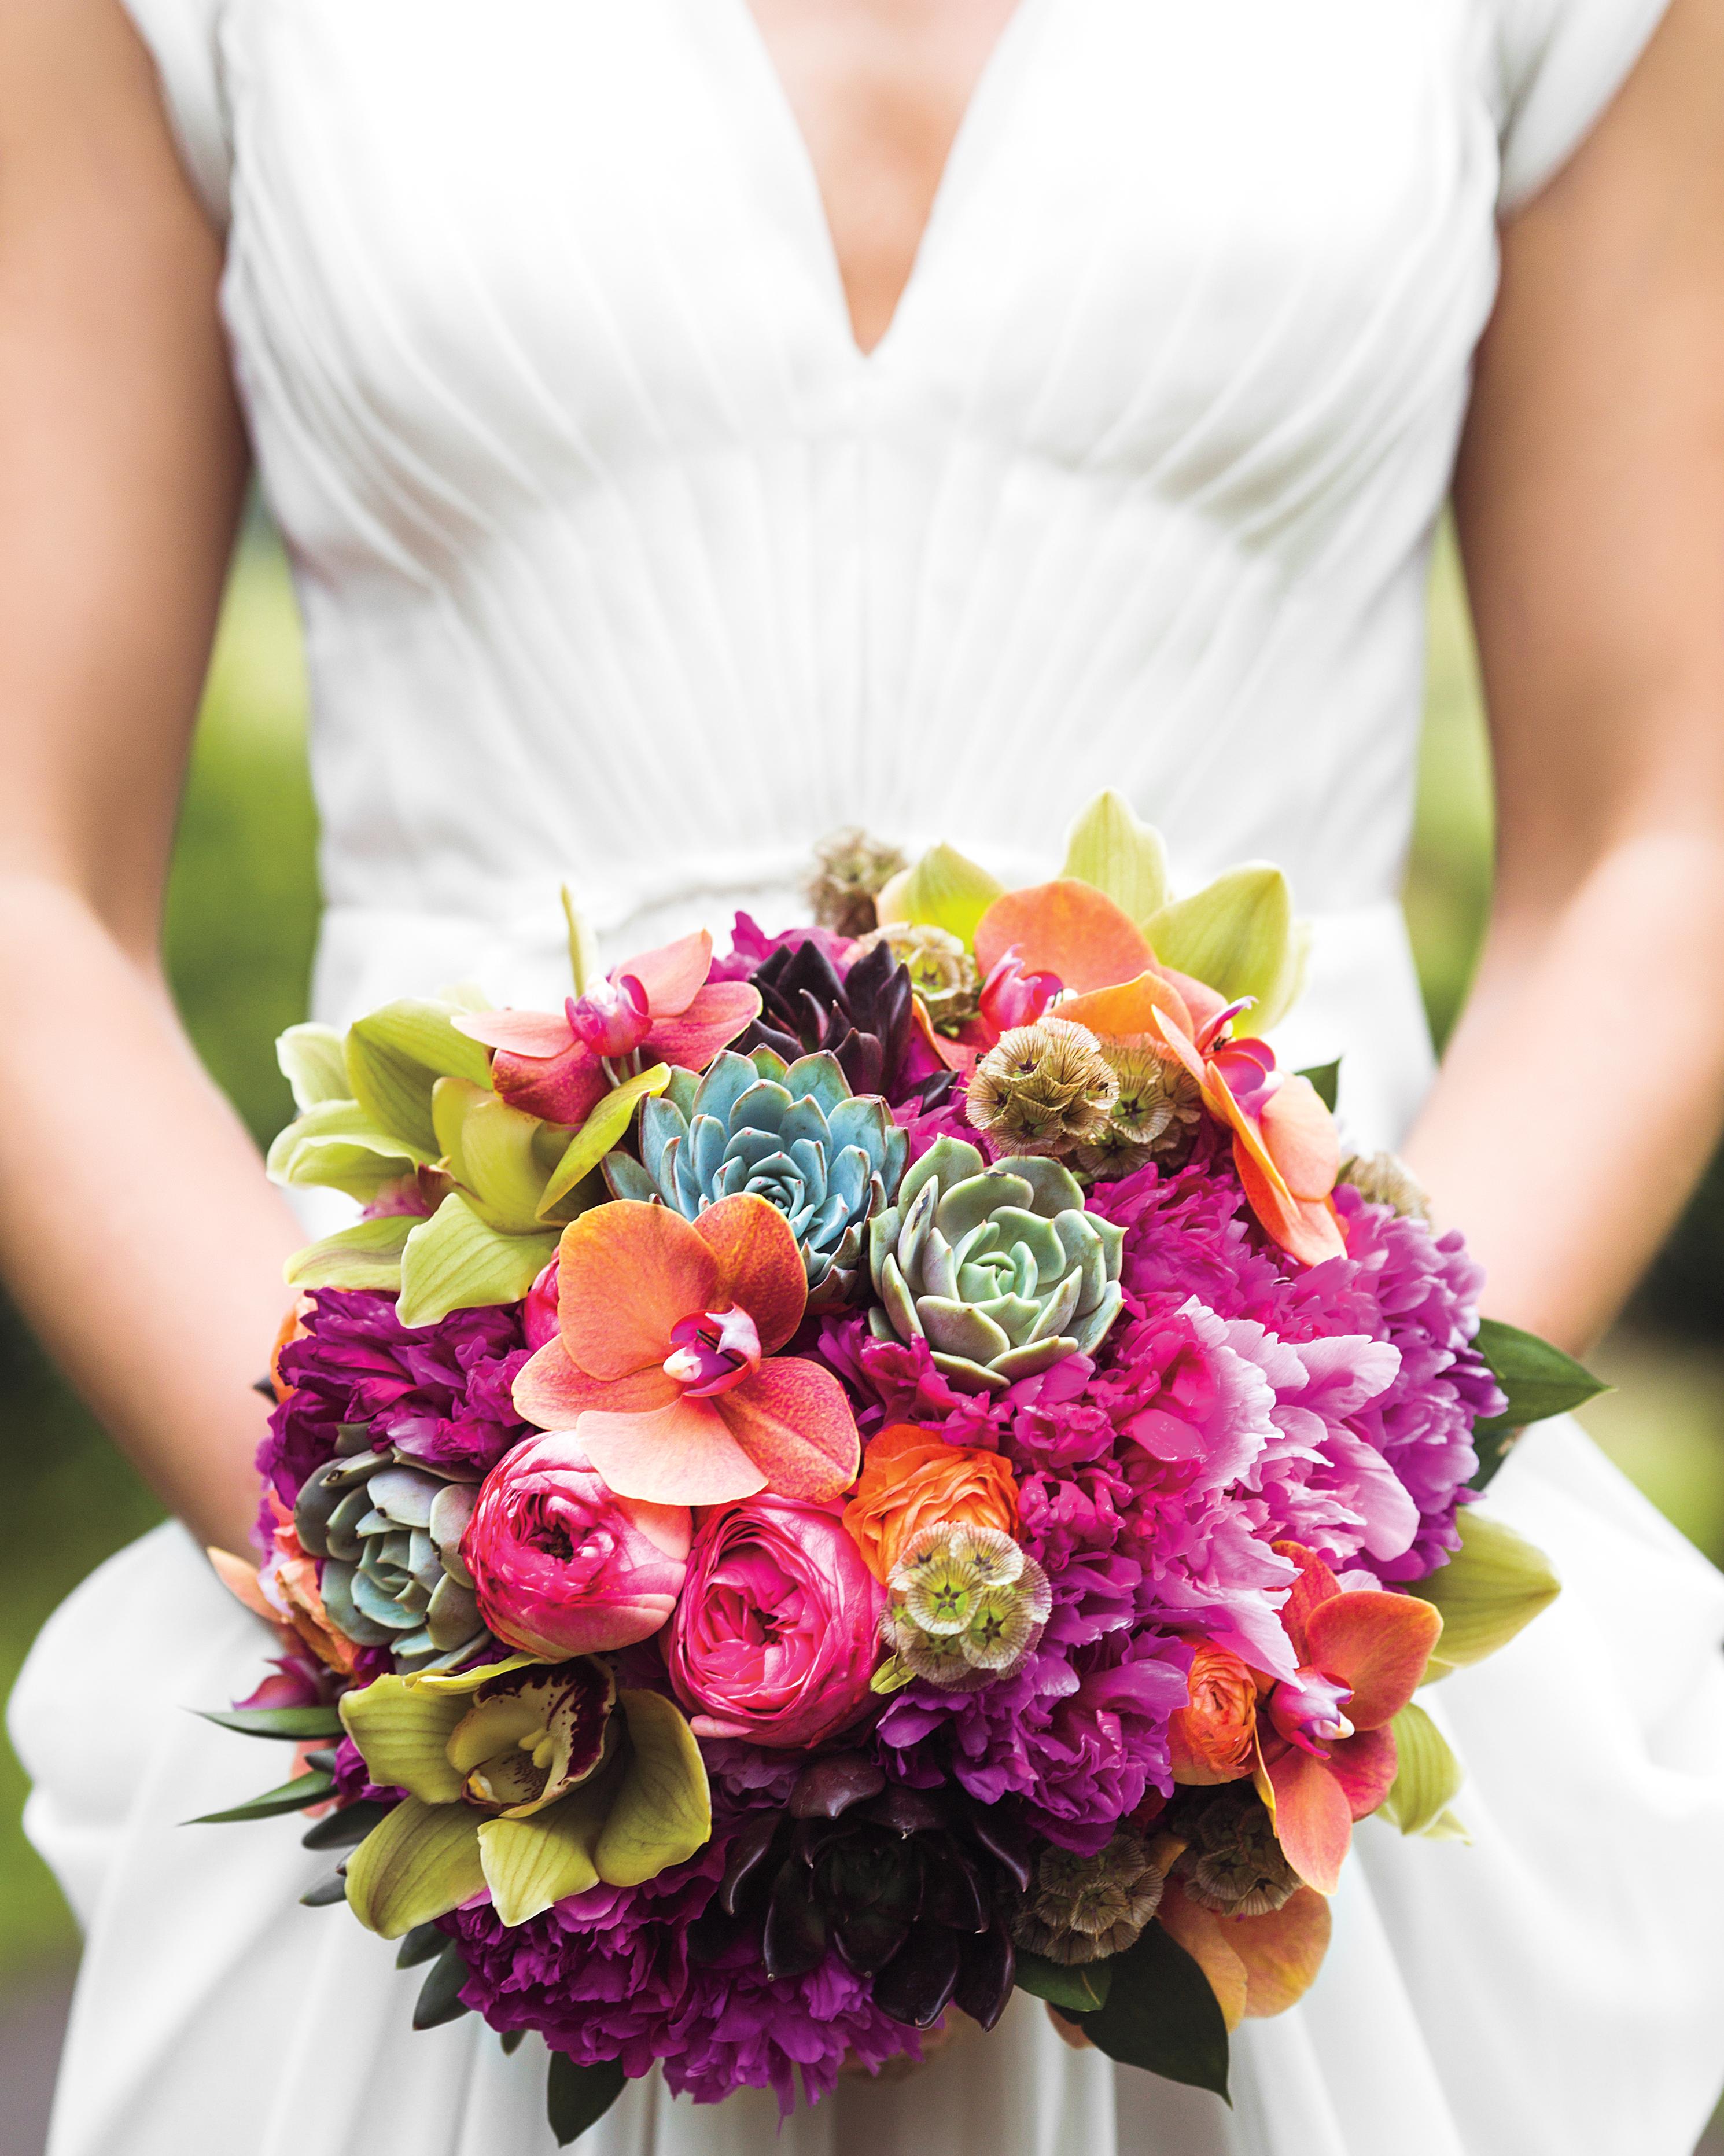 liz-and-michael-bride-bouquet-4024-ds111296.jpg